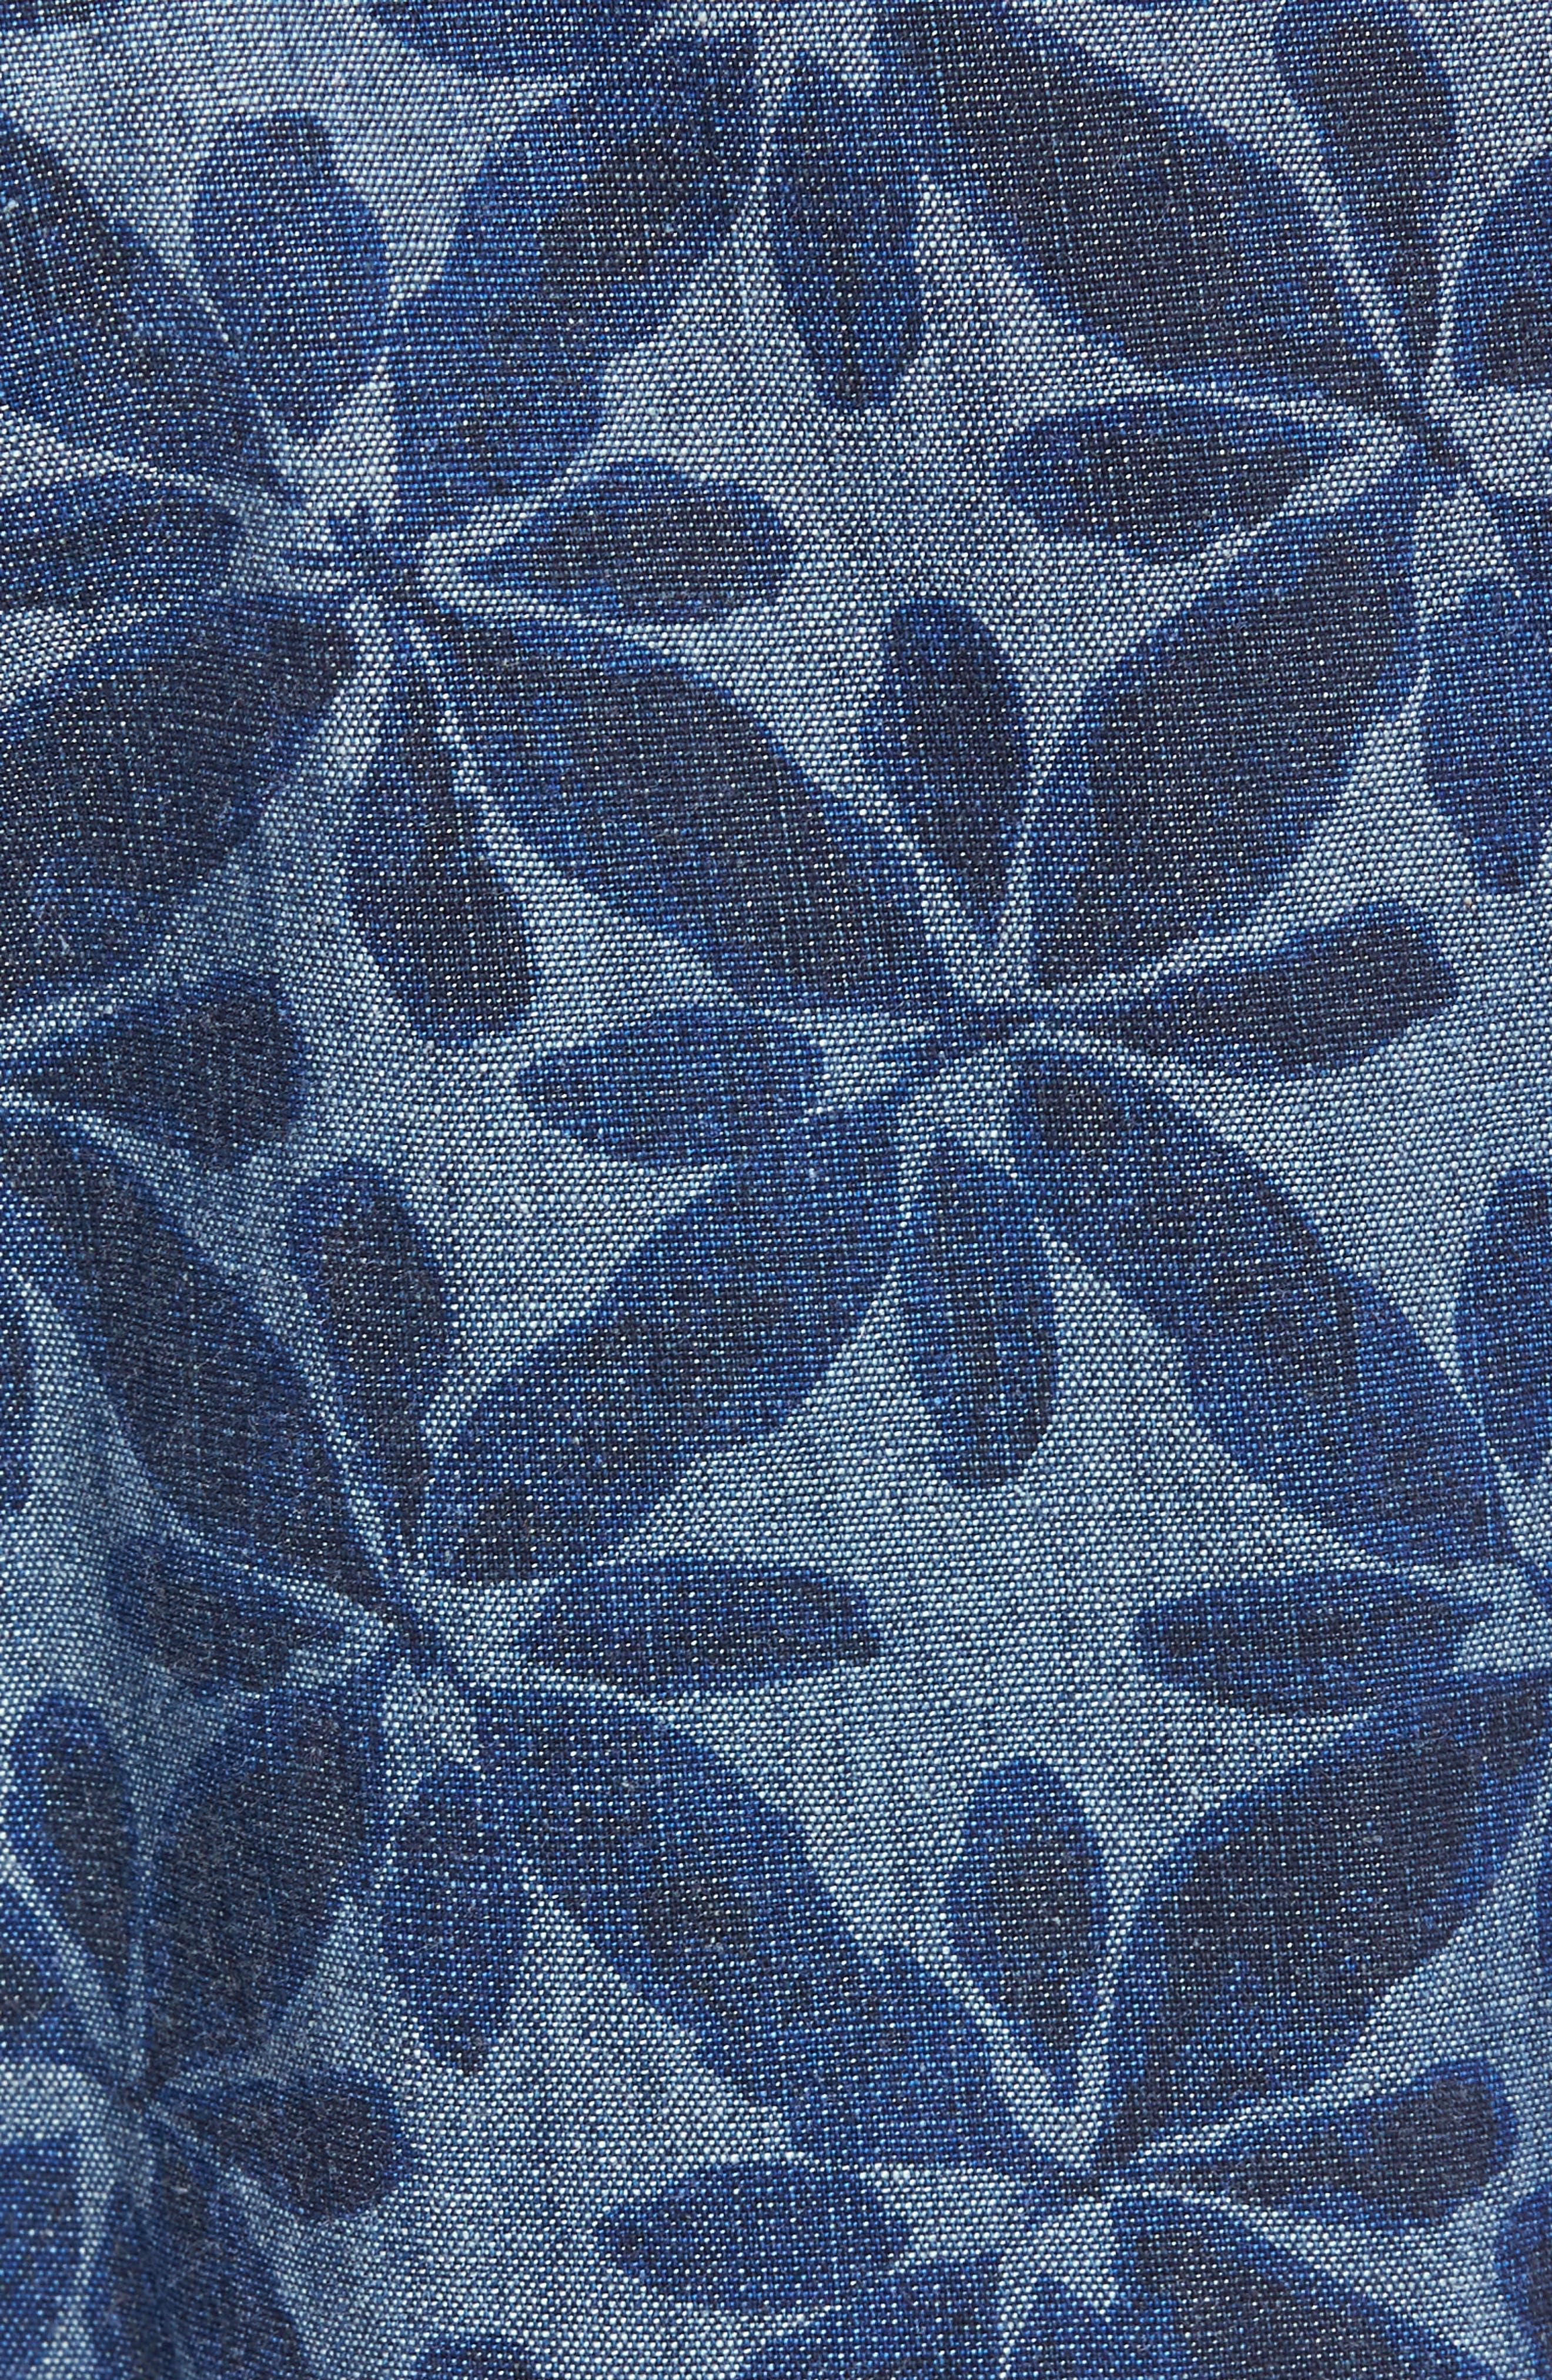 Franju Floral Cotton Shorts,                             Alternate thumbnail 5, color,                             Rinse And Softener